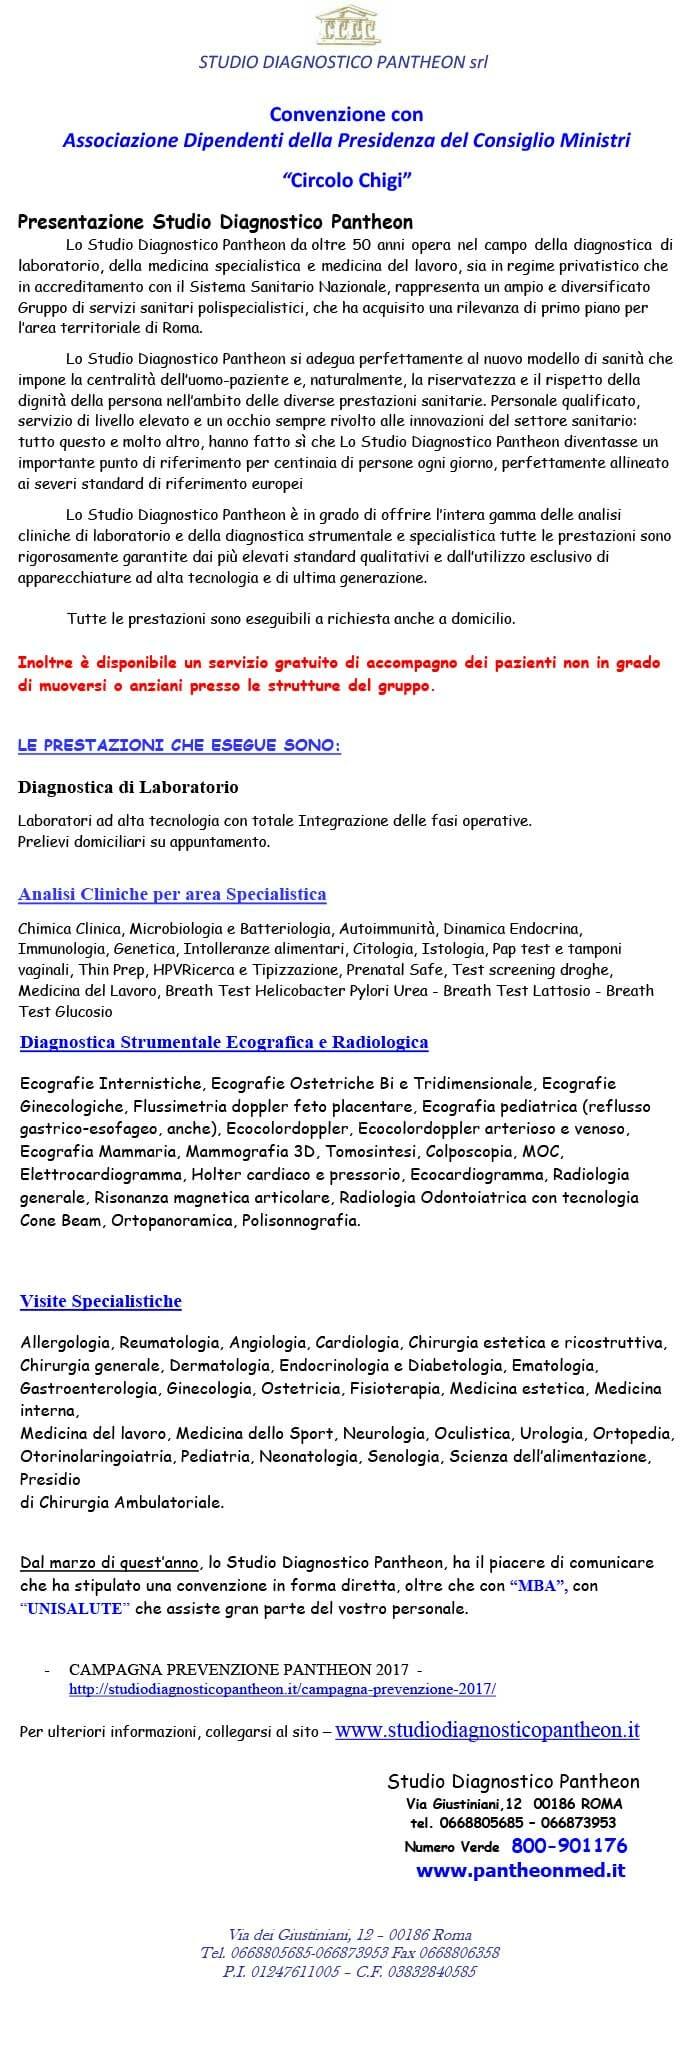 Studio Diagnostico Pantheon